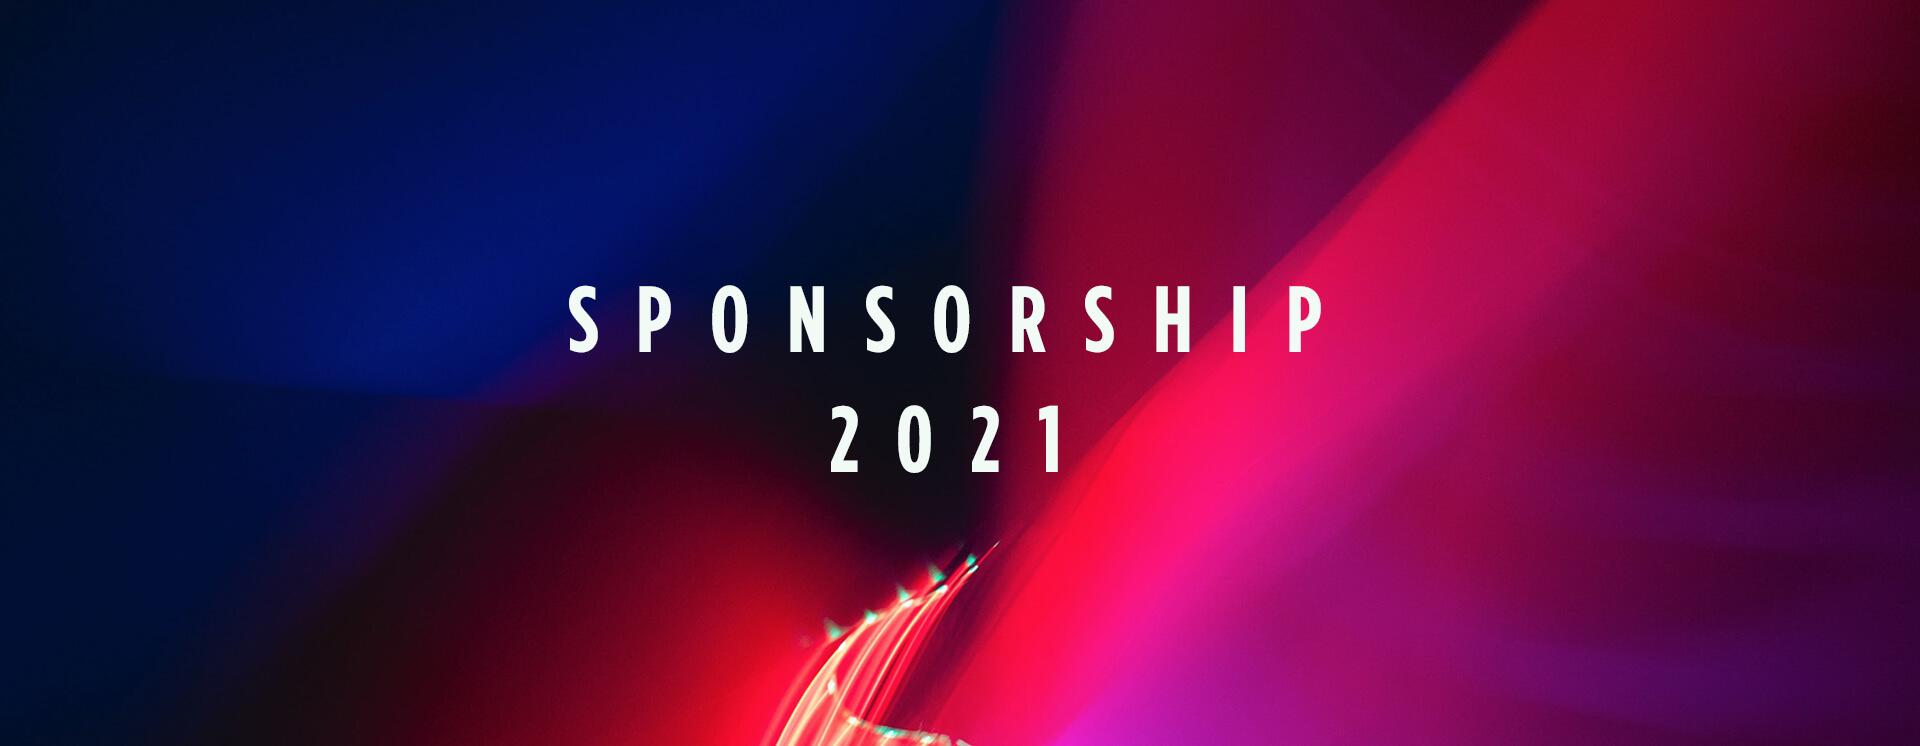 Sponsorhsip